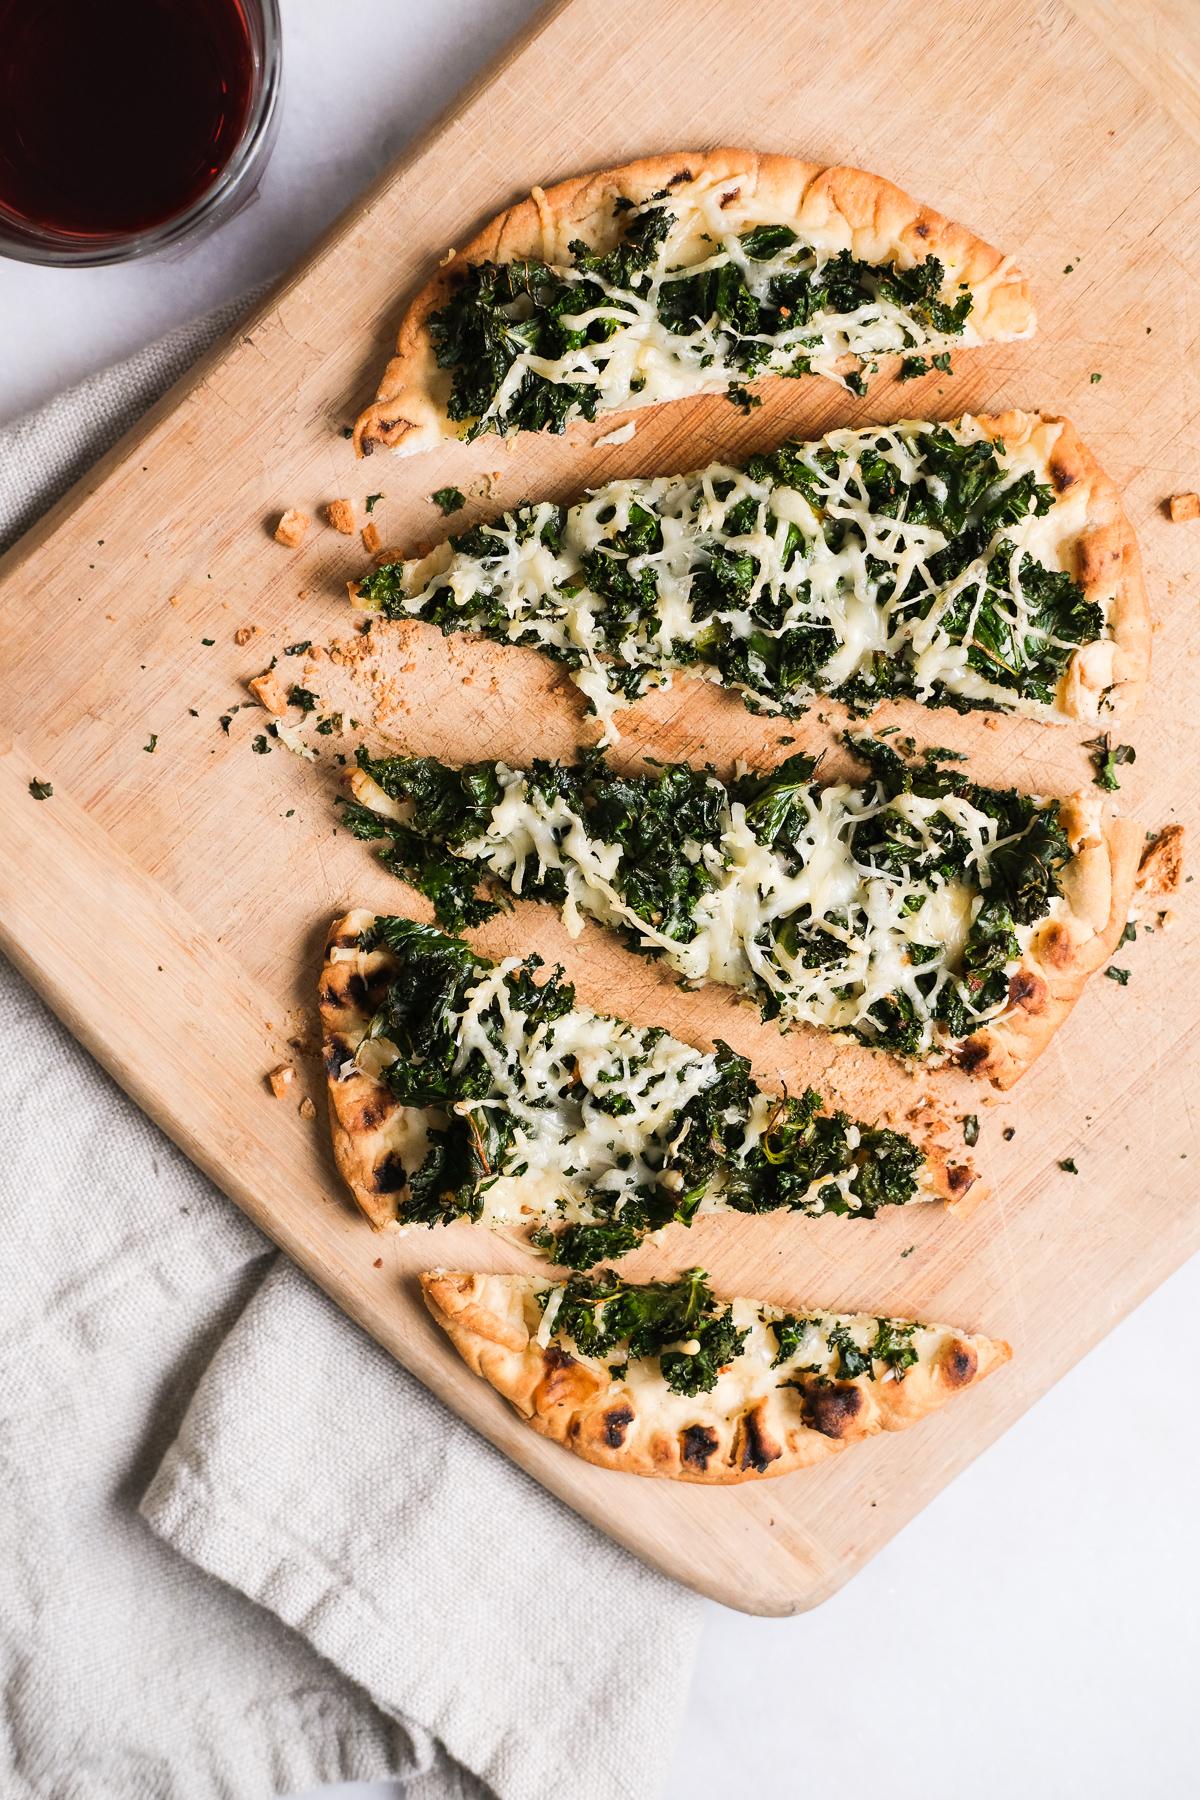 kale parmesan flatbread pizza cut up on a cutting board